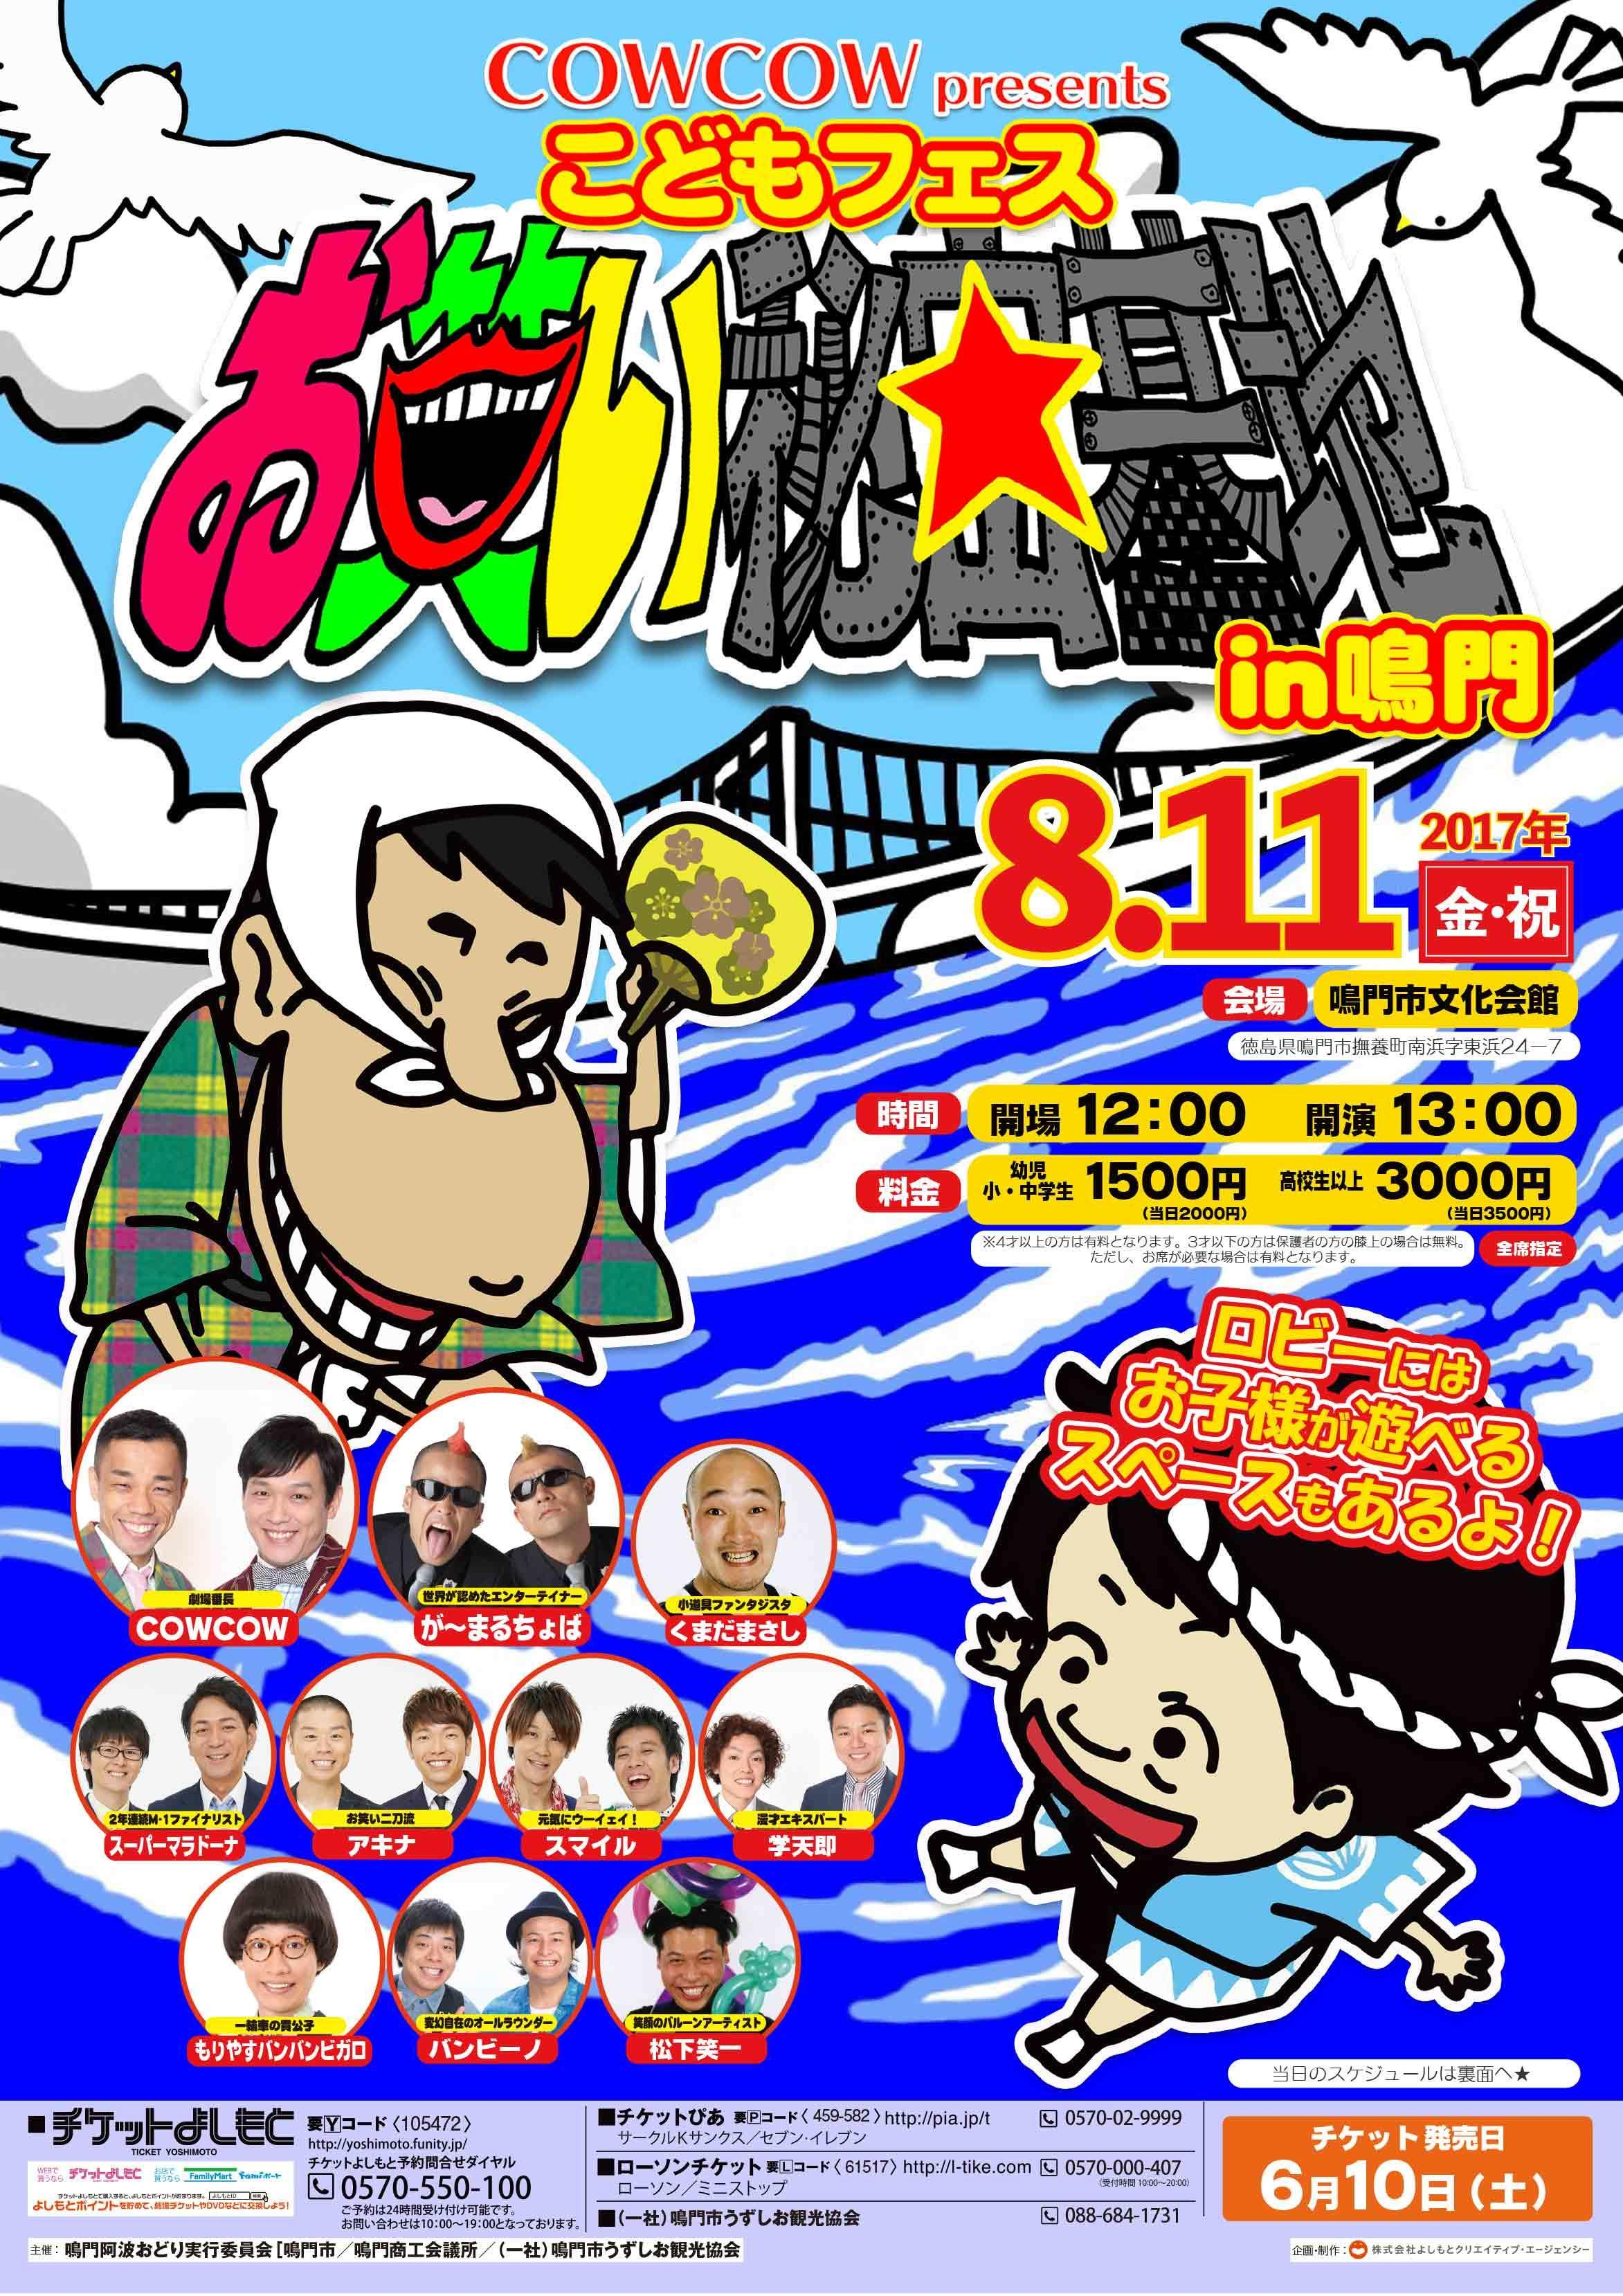 http://www.syumatsu.jp/20170613114305-146d84c32f4f706f0412f0627d034bce32e5bf62.jpg